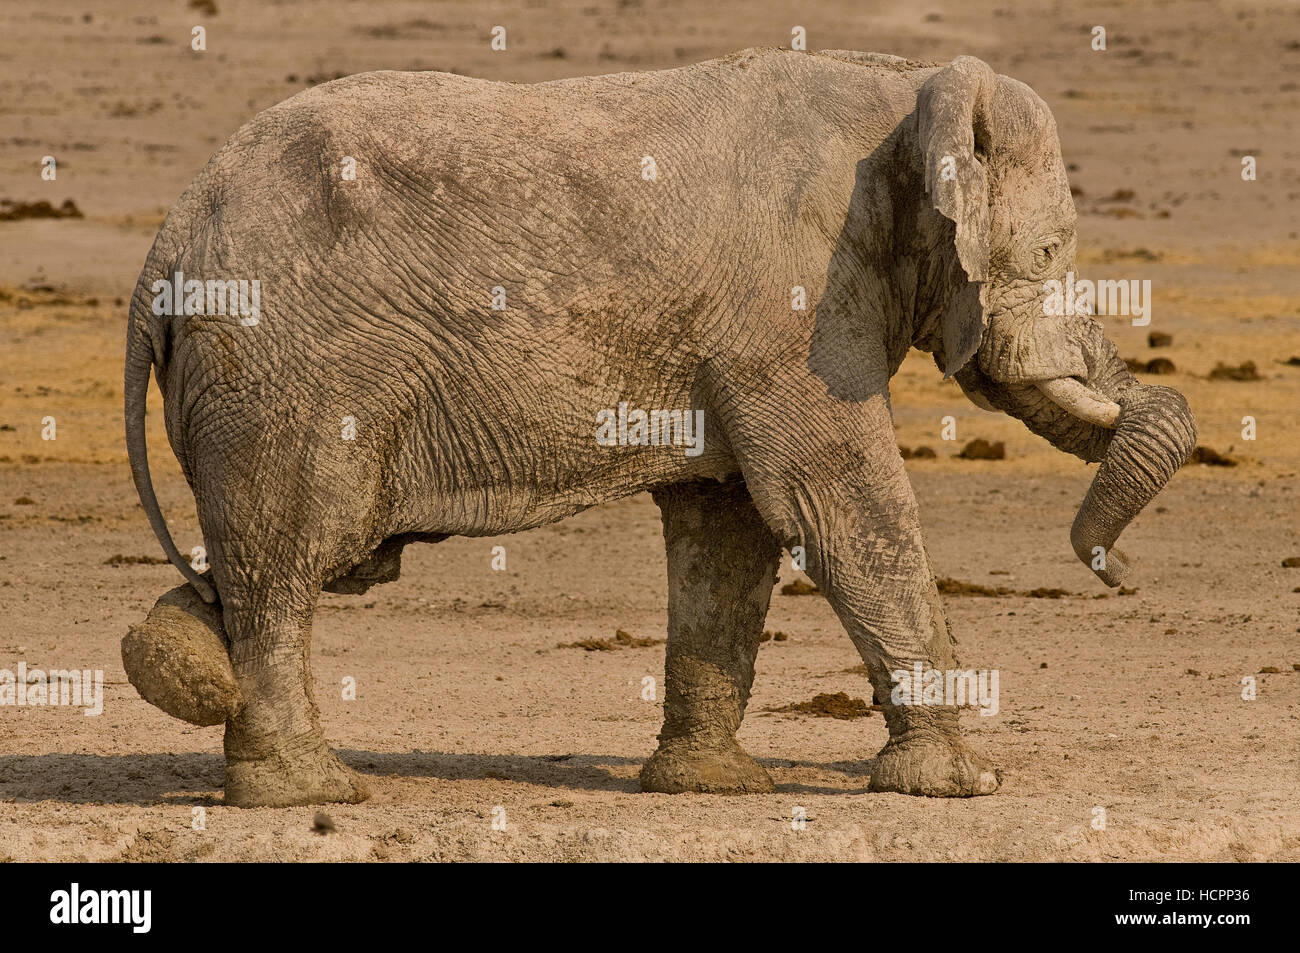 Desert Elephant (Loxodonta africana) dans un yoga pose Photo Stock